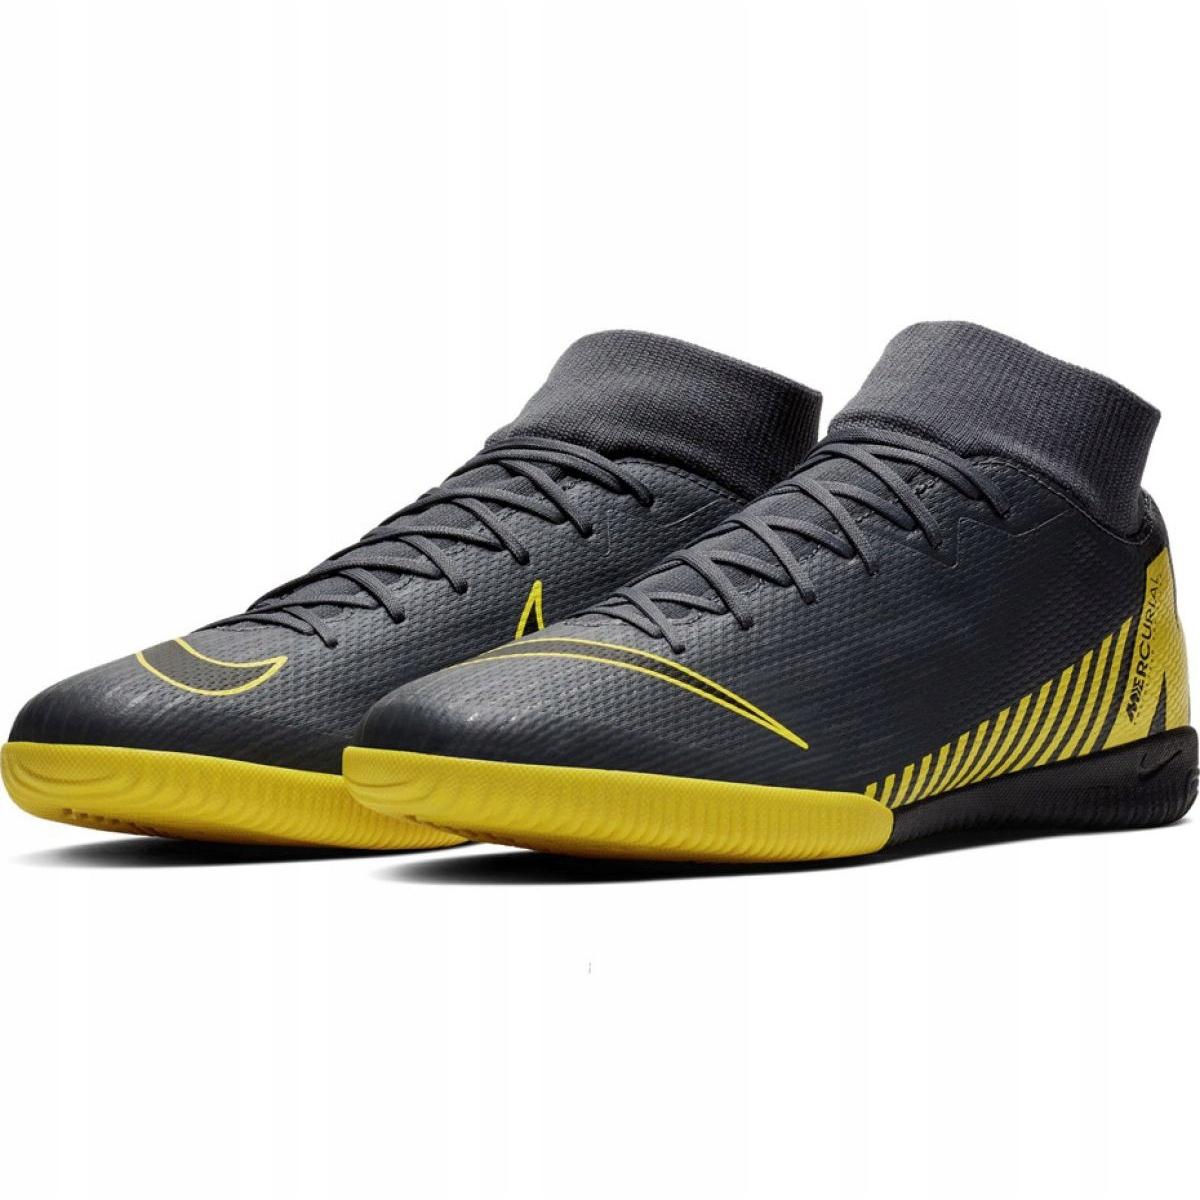 Hallenschuhe Nike Mercurial Superfly 6 Academy Ic M Ah7369 070